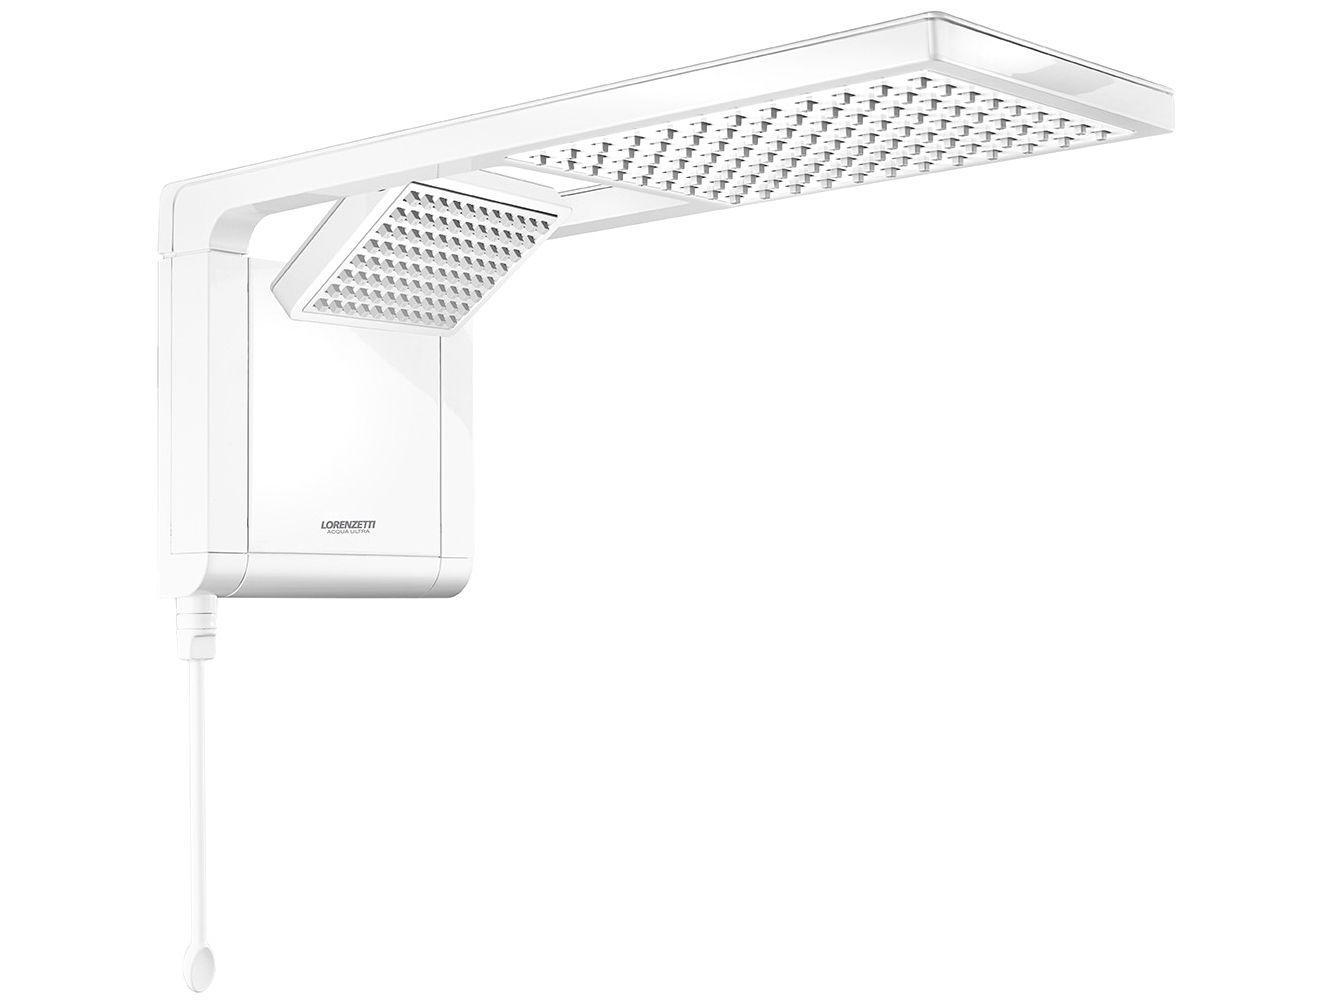 Chuveiro Eletrônico Lorenzetti Ultra Aqua Duo - 7800W Branco Temperatura Gradual